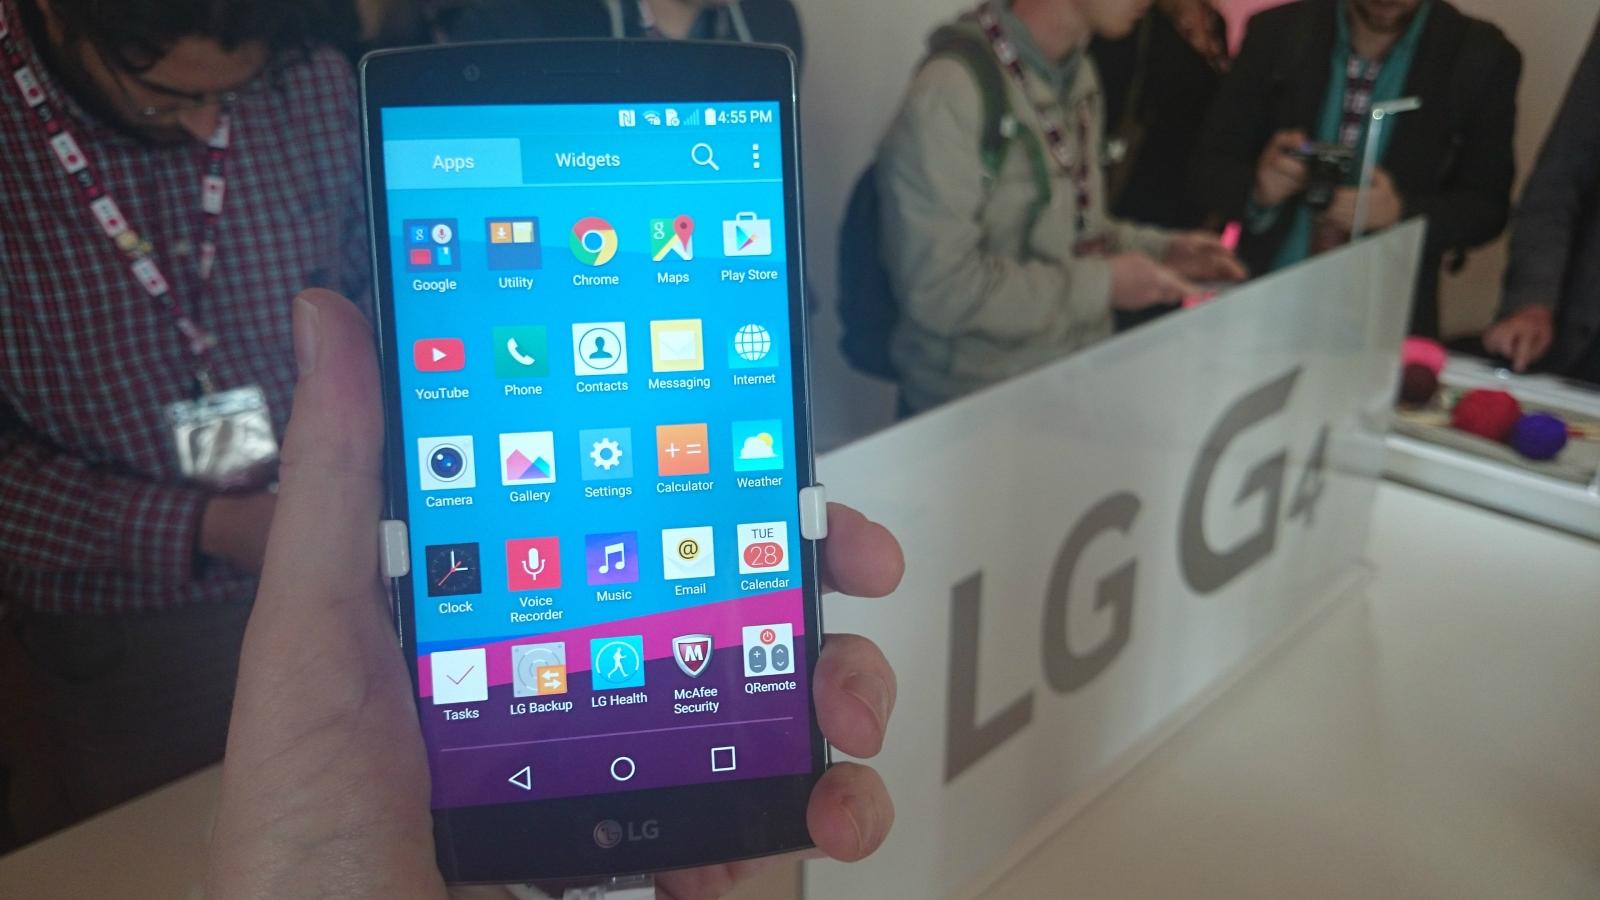 LG G4 review camera specs